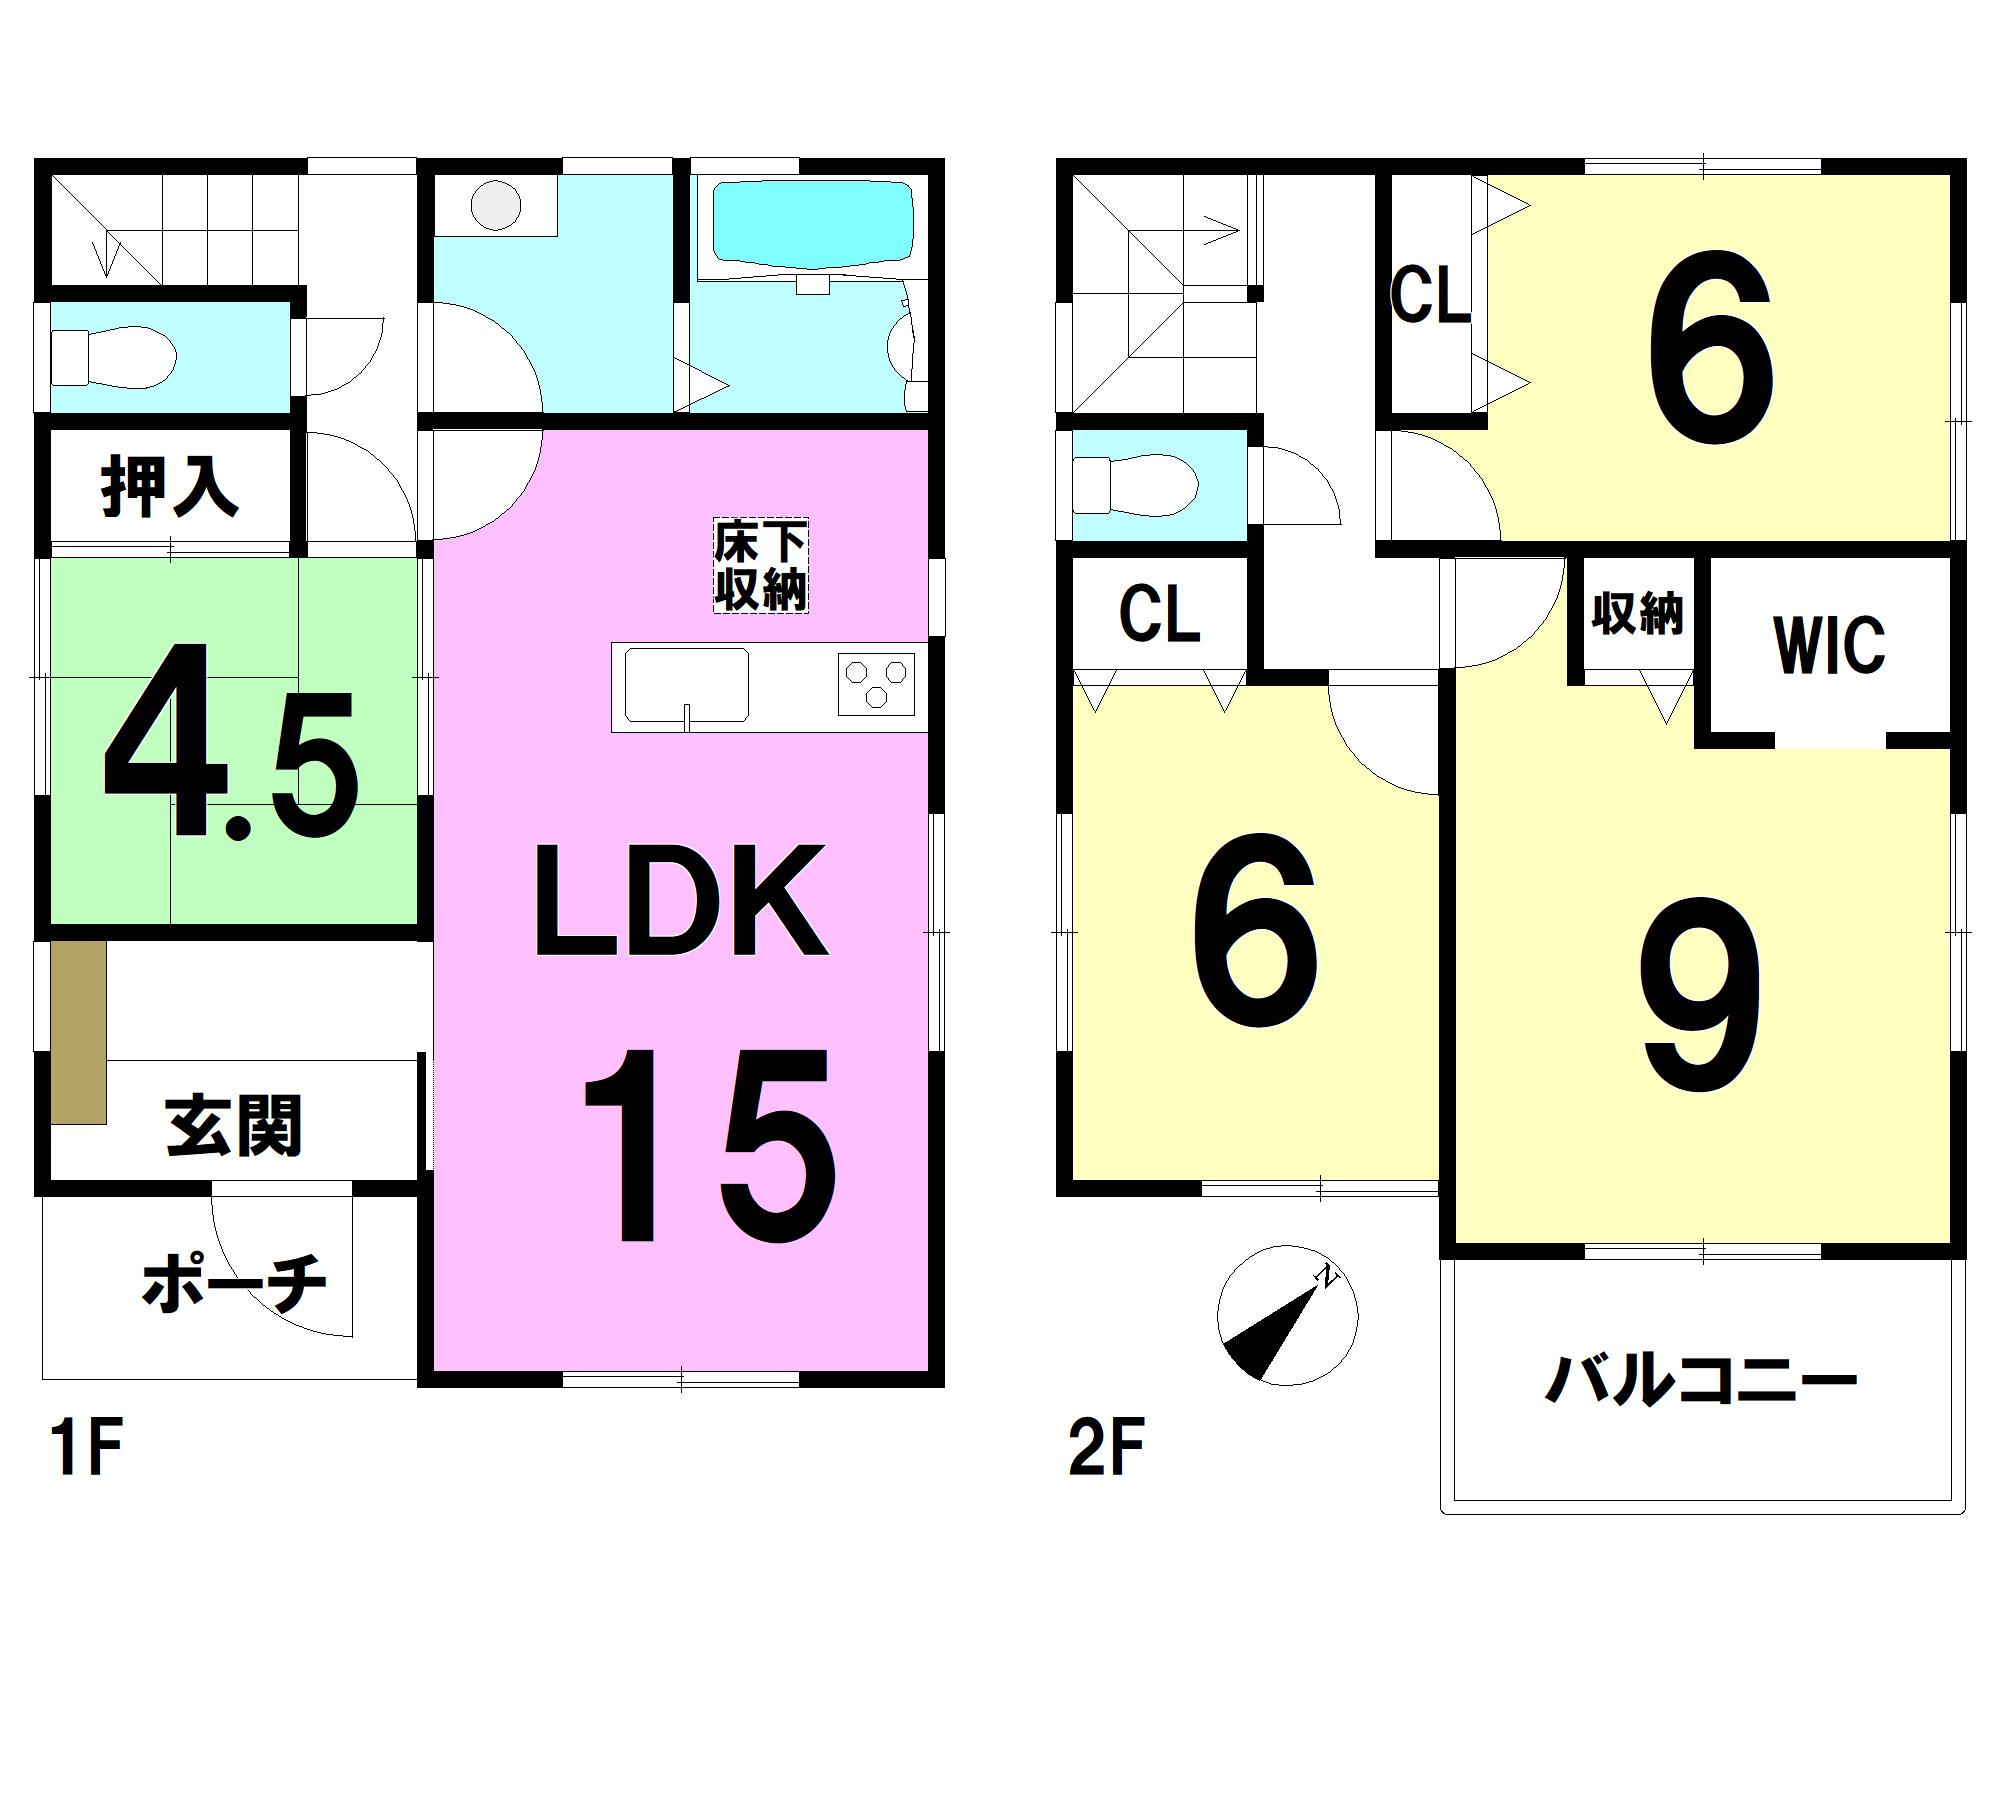 【間取り】 1F:15LDK 4.5和 2F:9洋 6洋 6洋 WIC トイレ